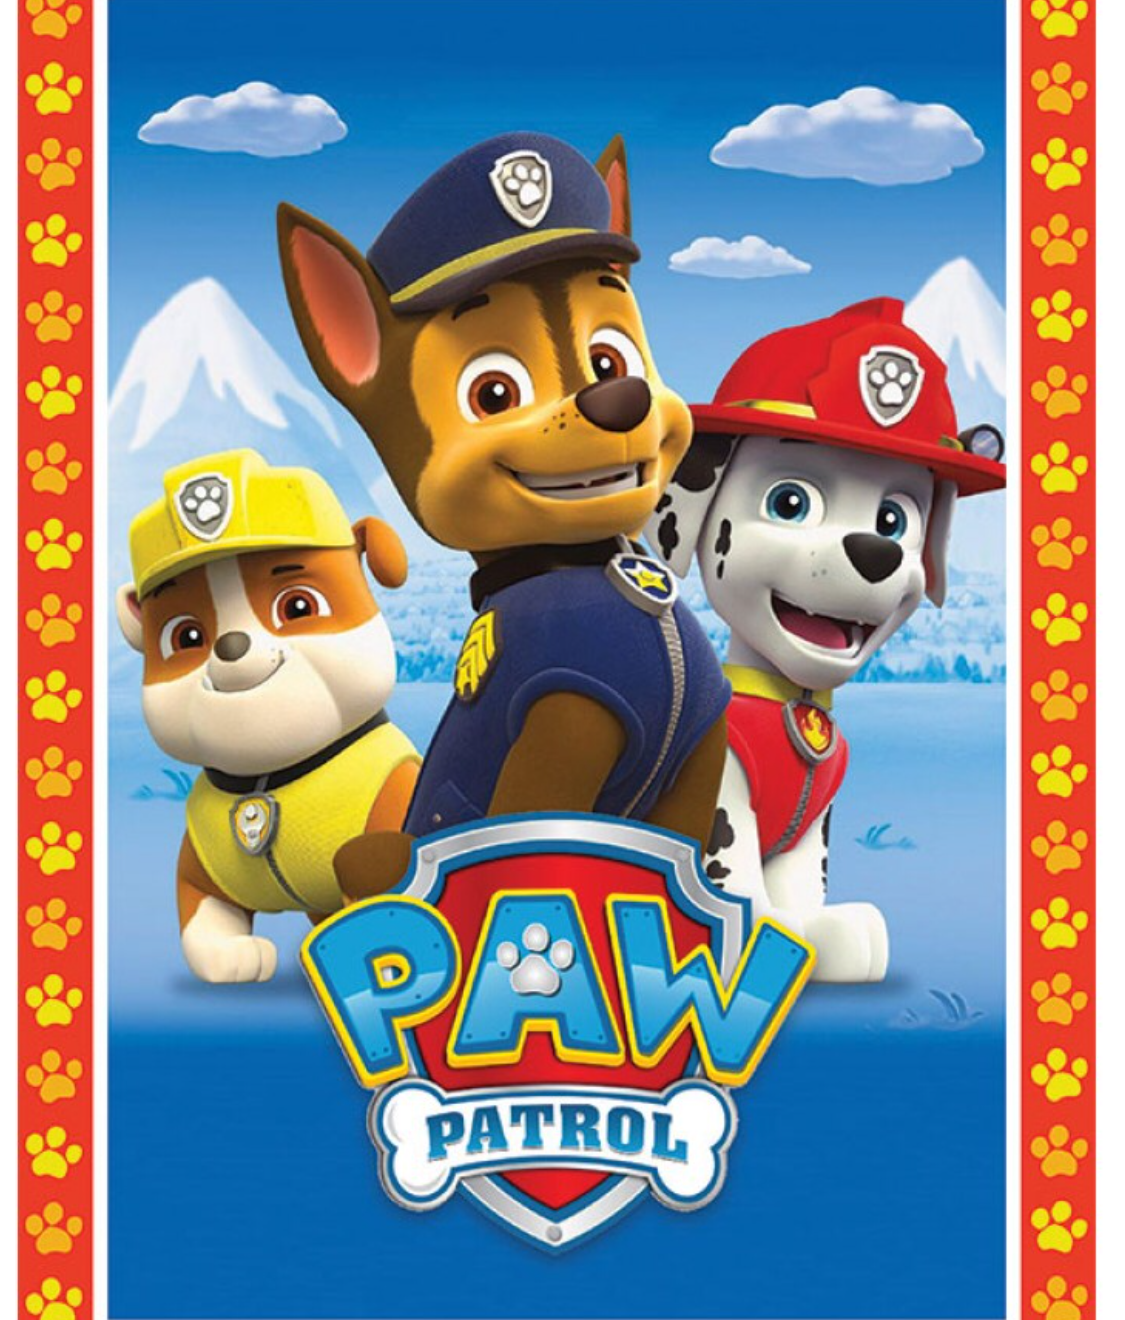 Paw Patrol printed edible icing image cake toppers